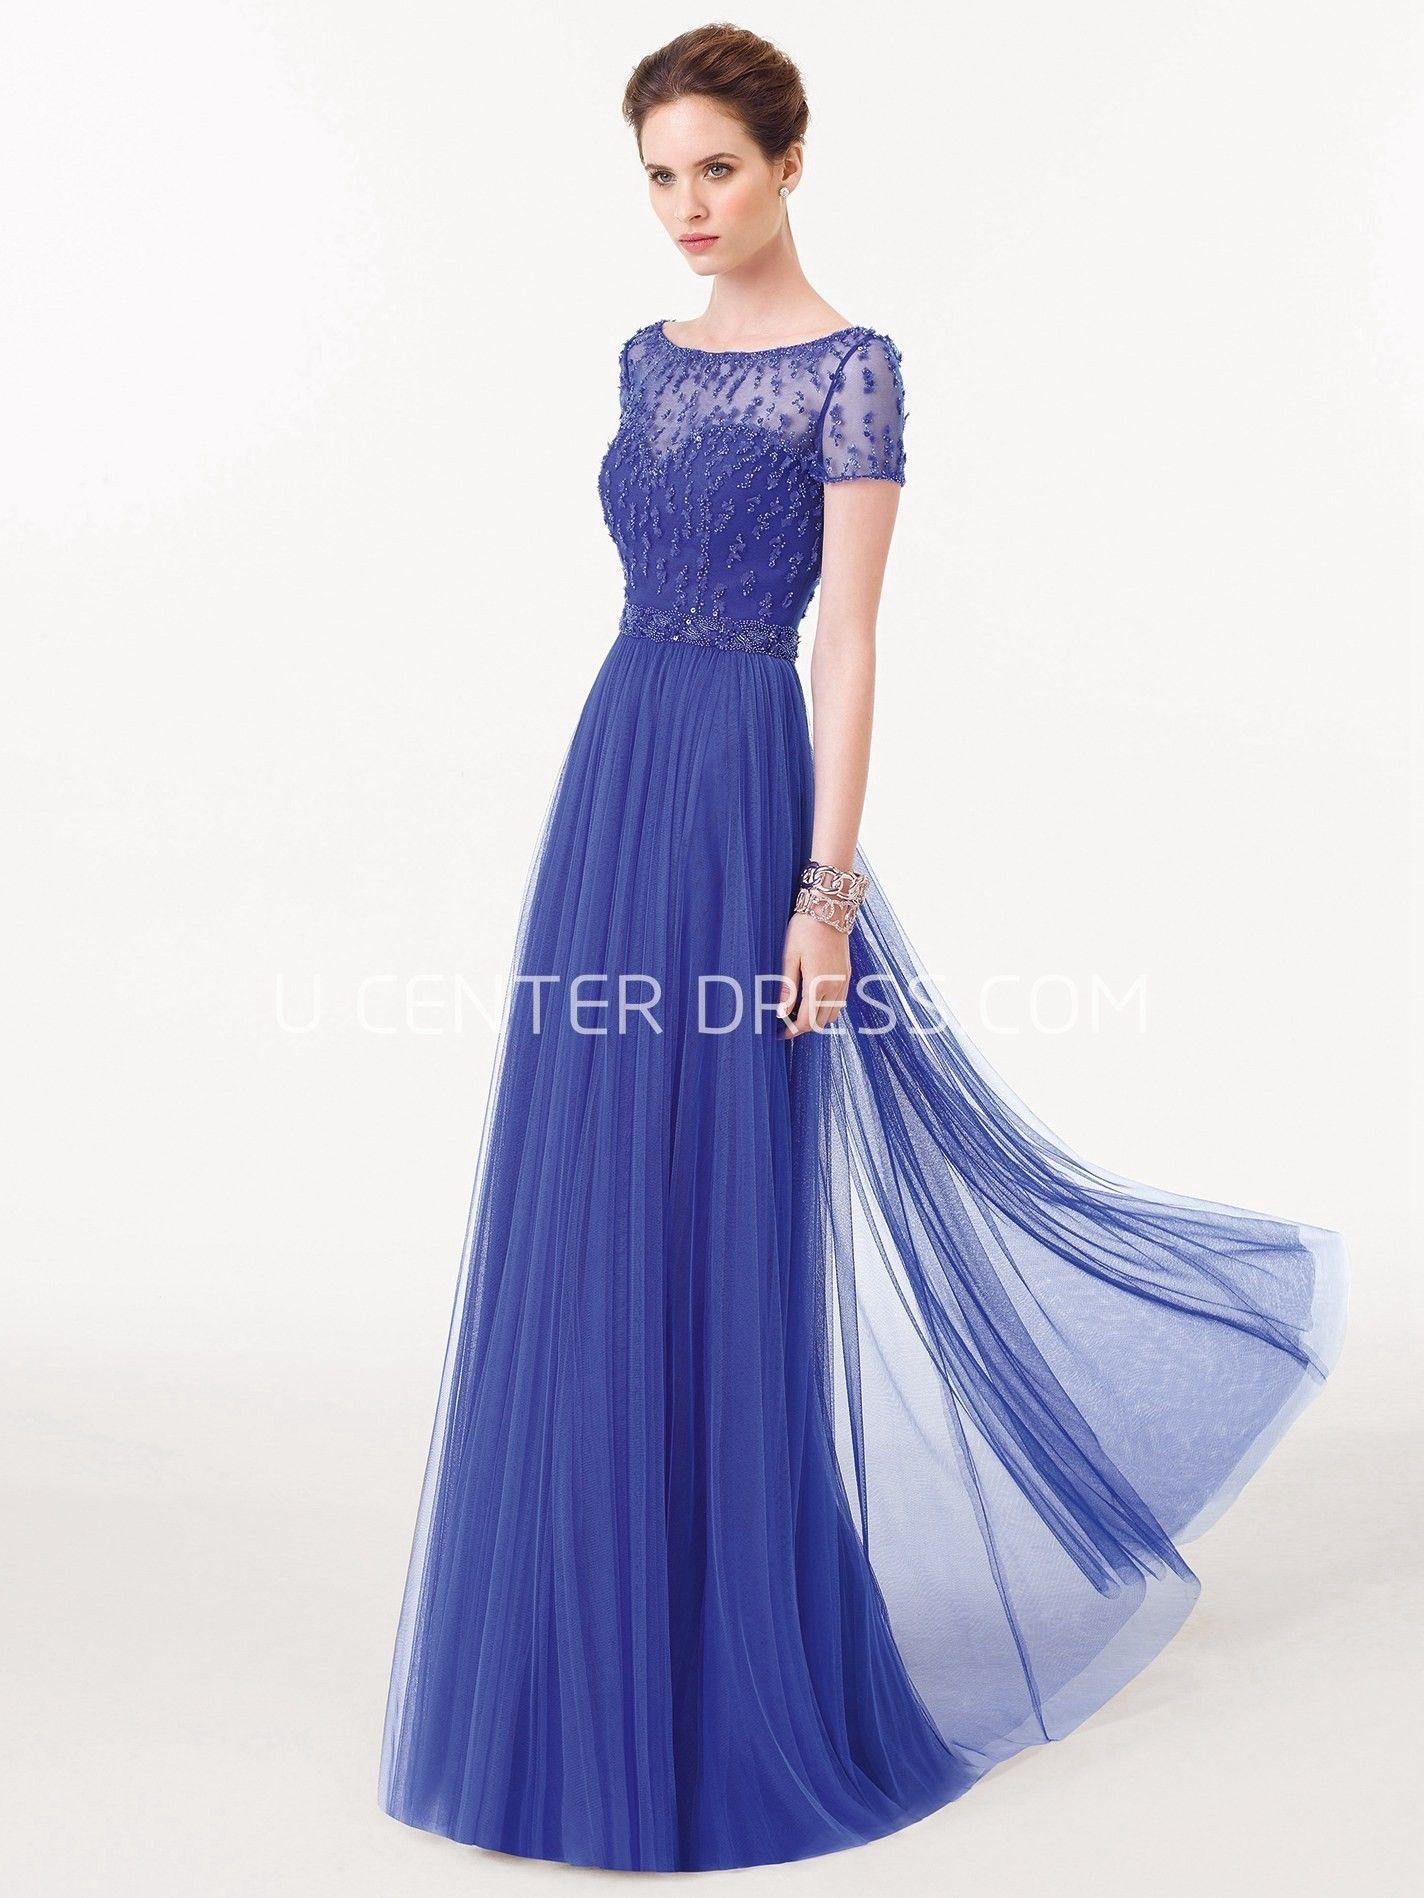 Bateau Neck Beaded Short Sleeve Tulle Prom Dress | Tulle prom dress ...